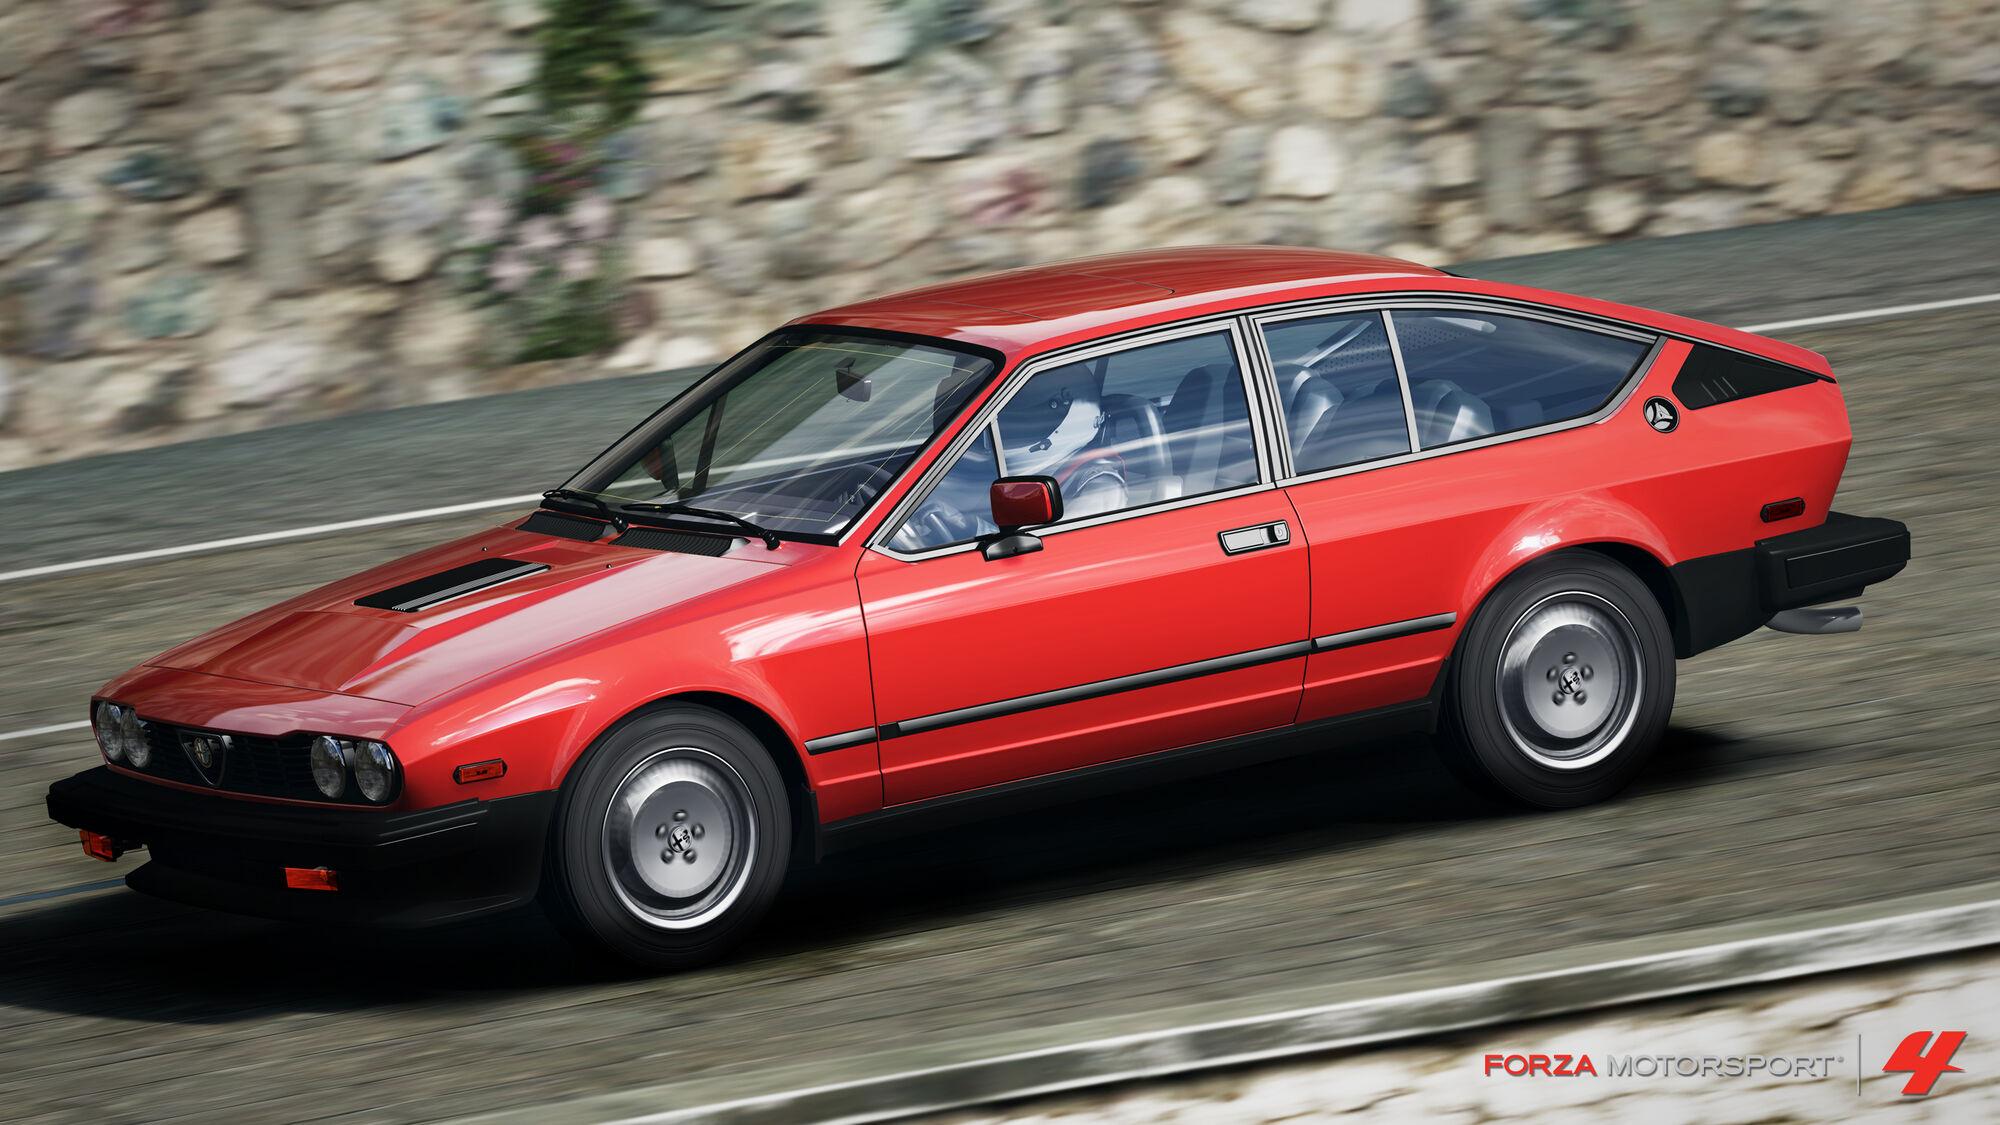 Image Alfa Romeo GTV 6 Forza Motorsport 4 Wiki